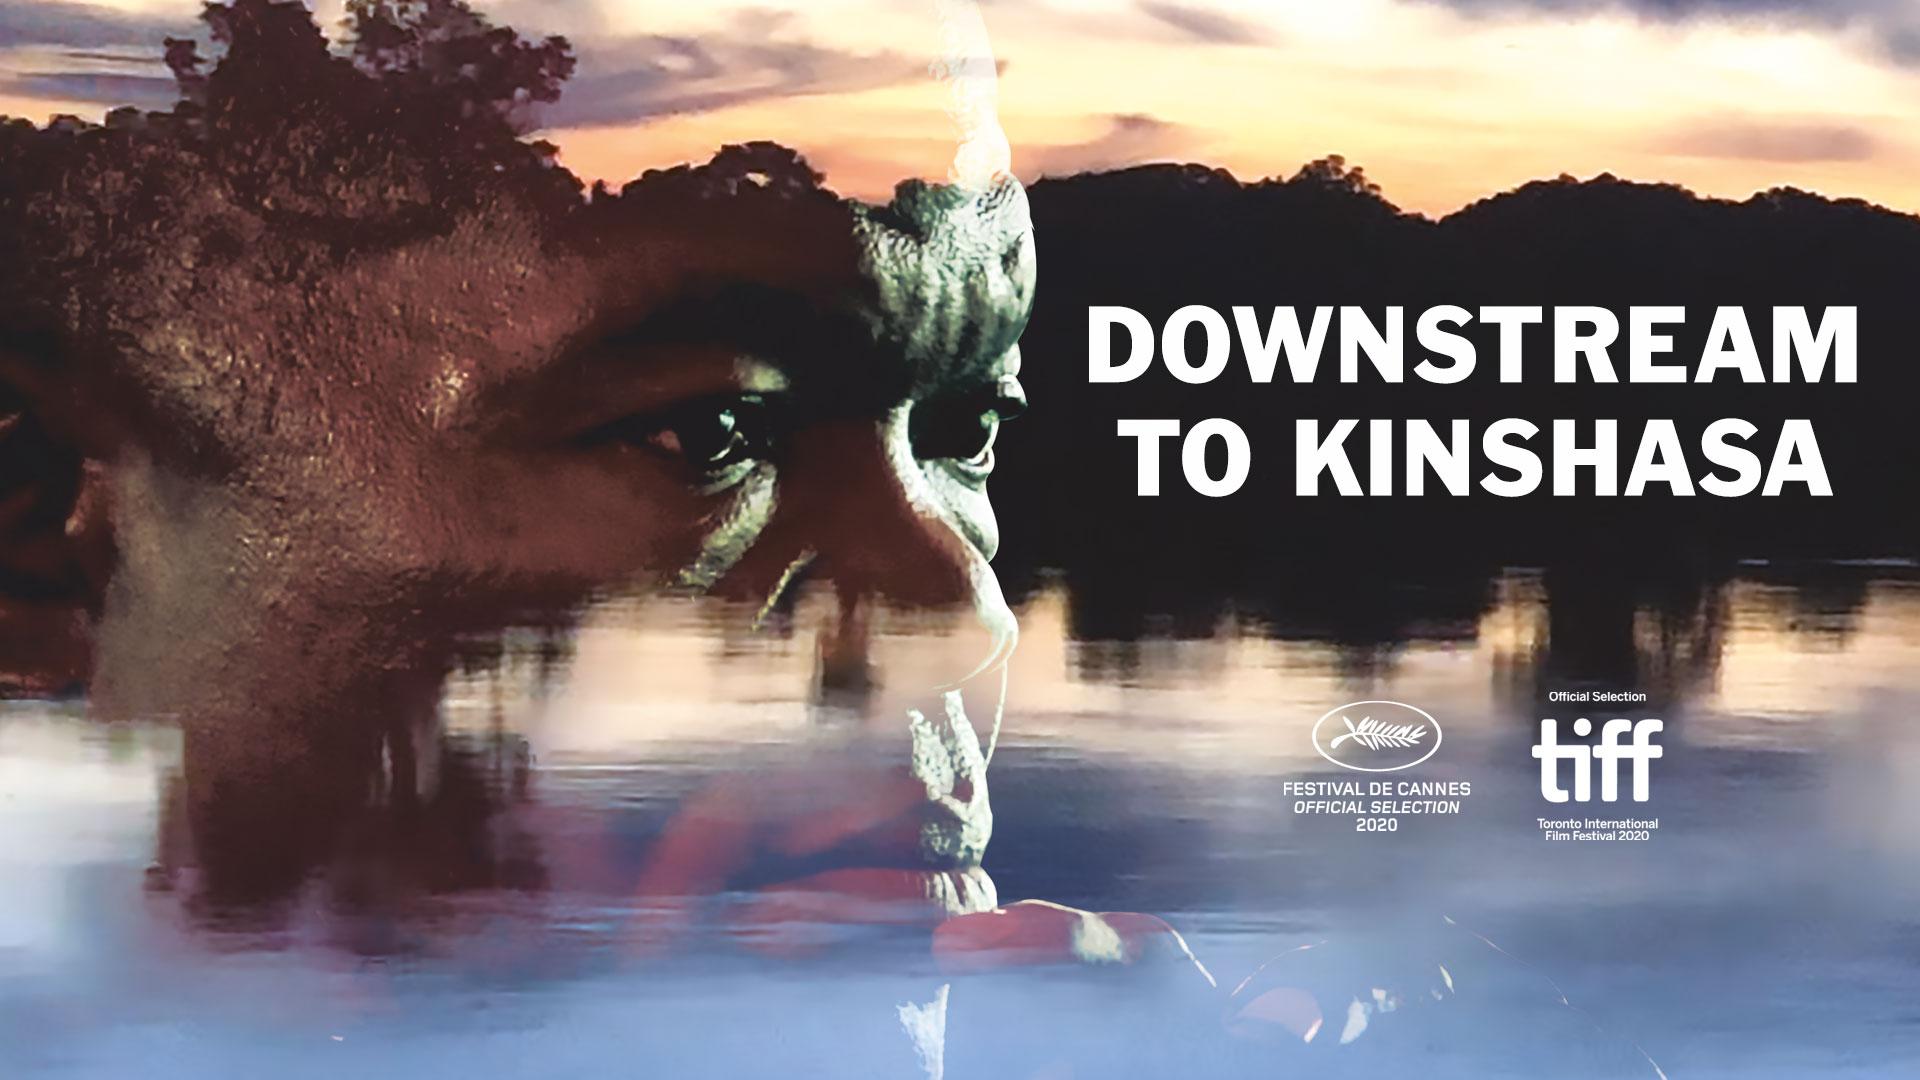 Downstream to Kinshasa - image